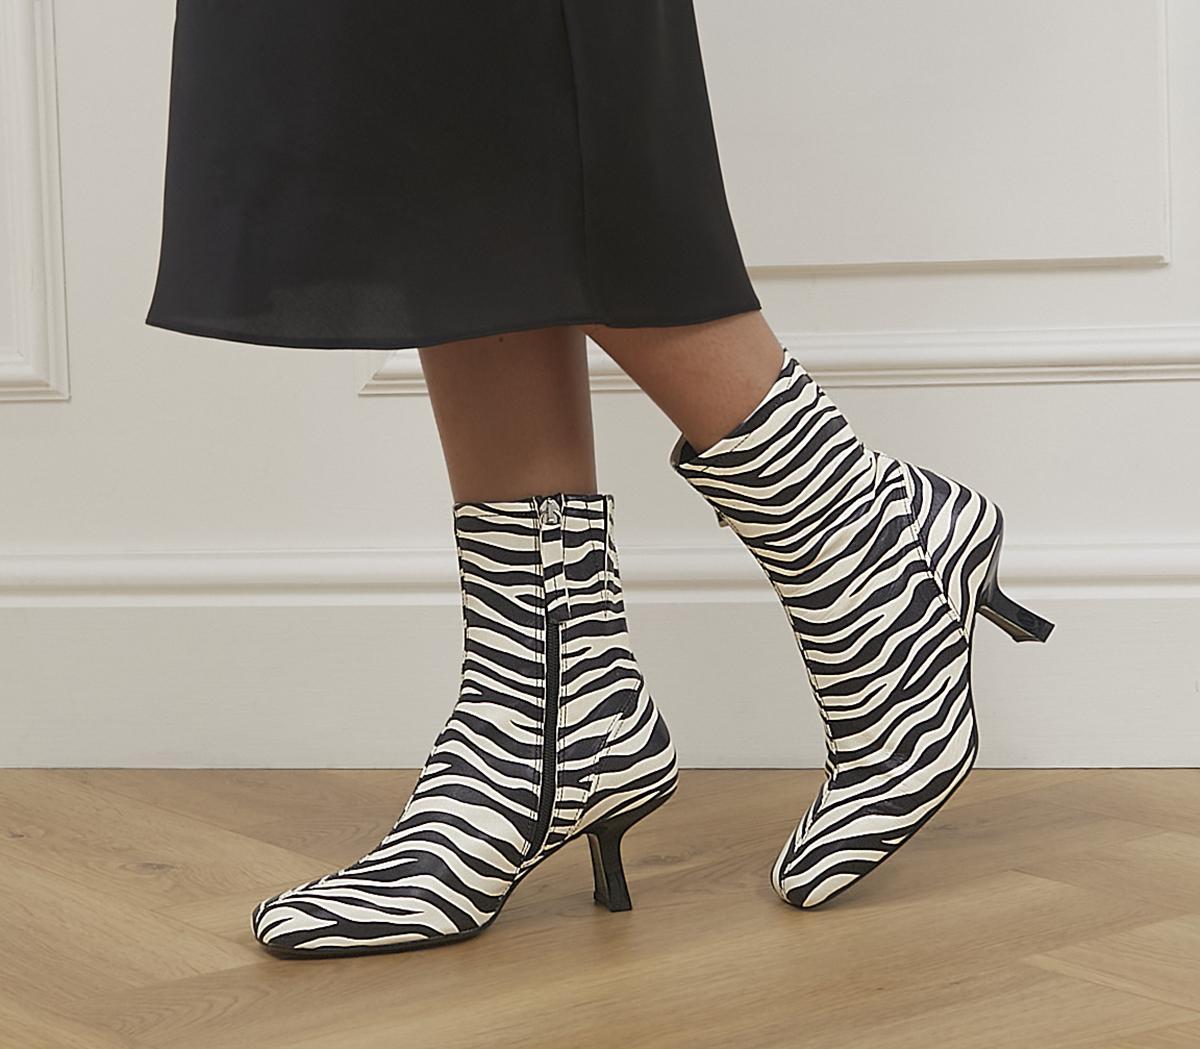 Acrobat Abstract Mid Heel Boots